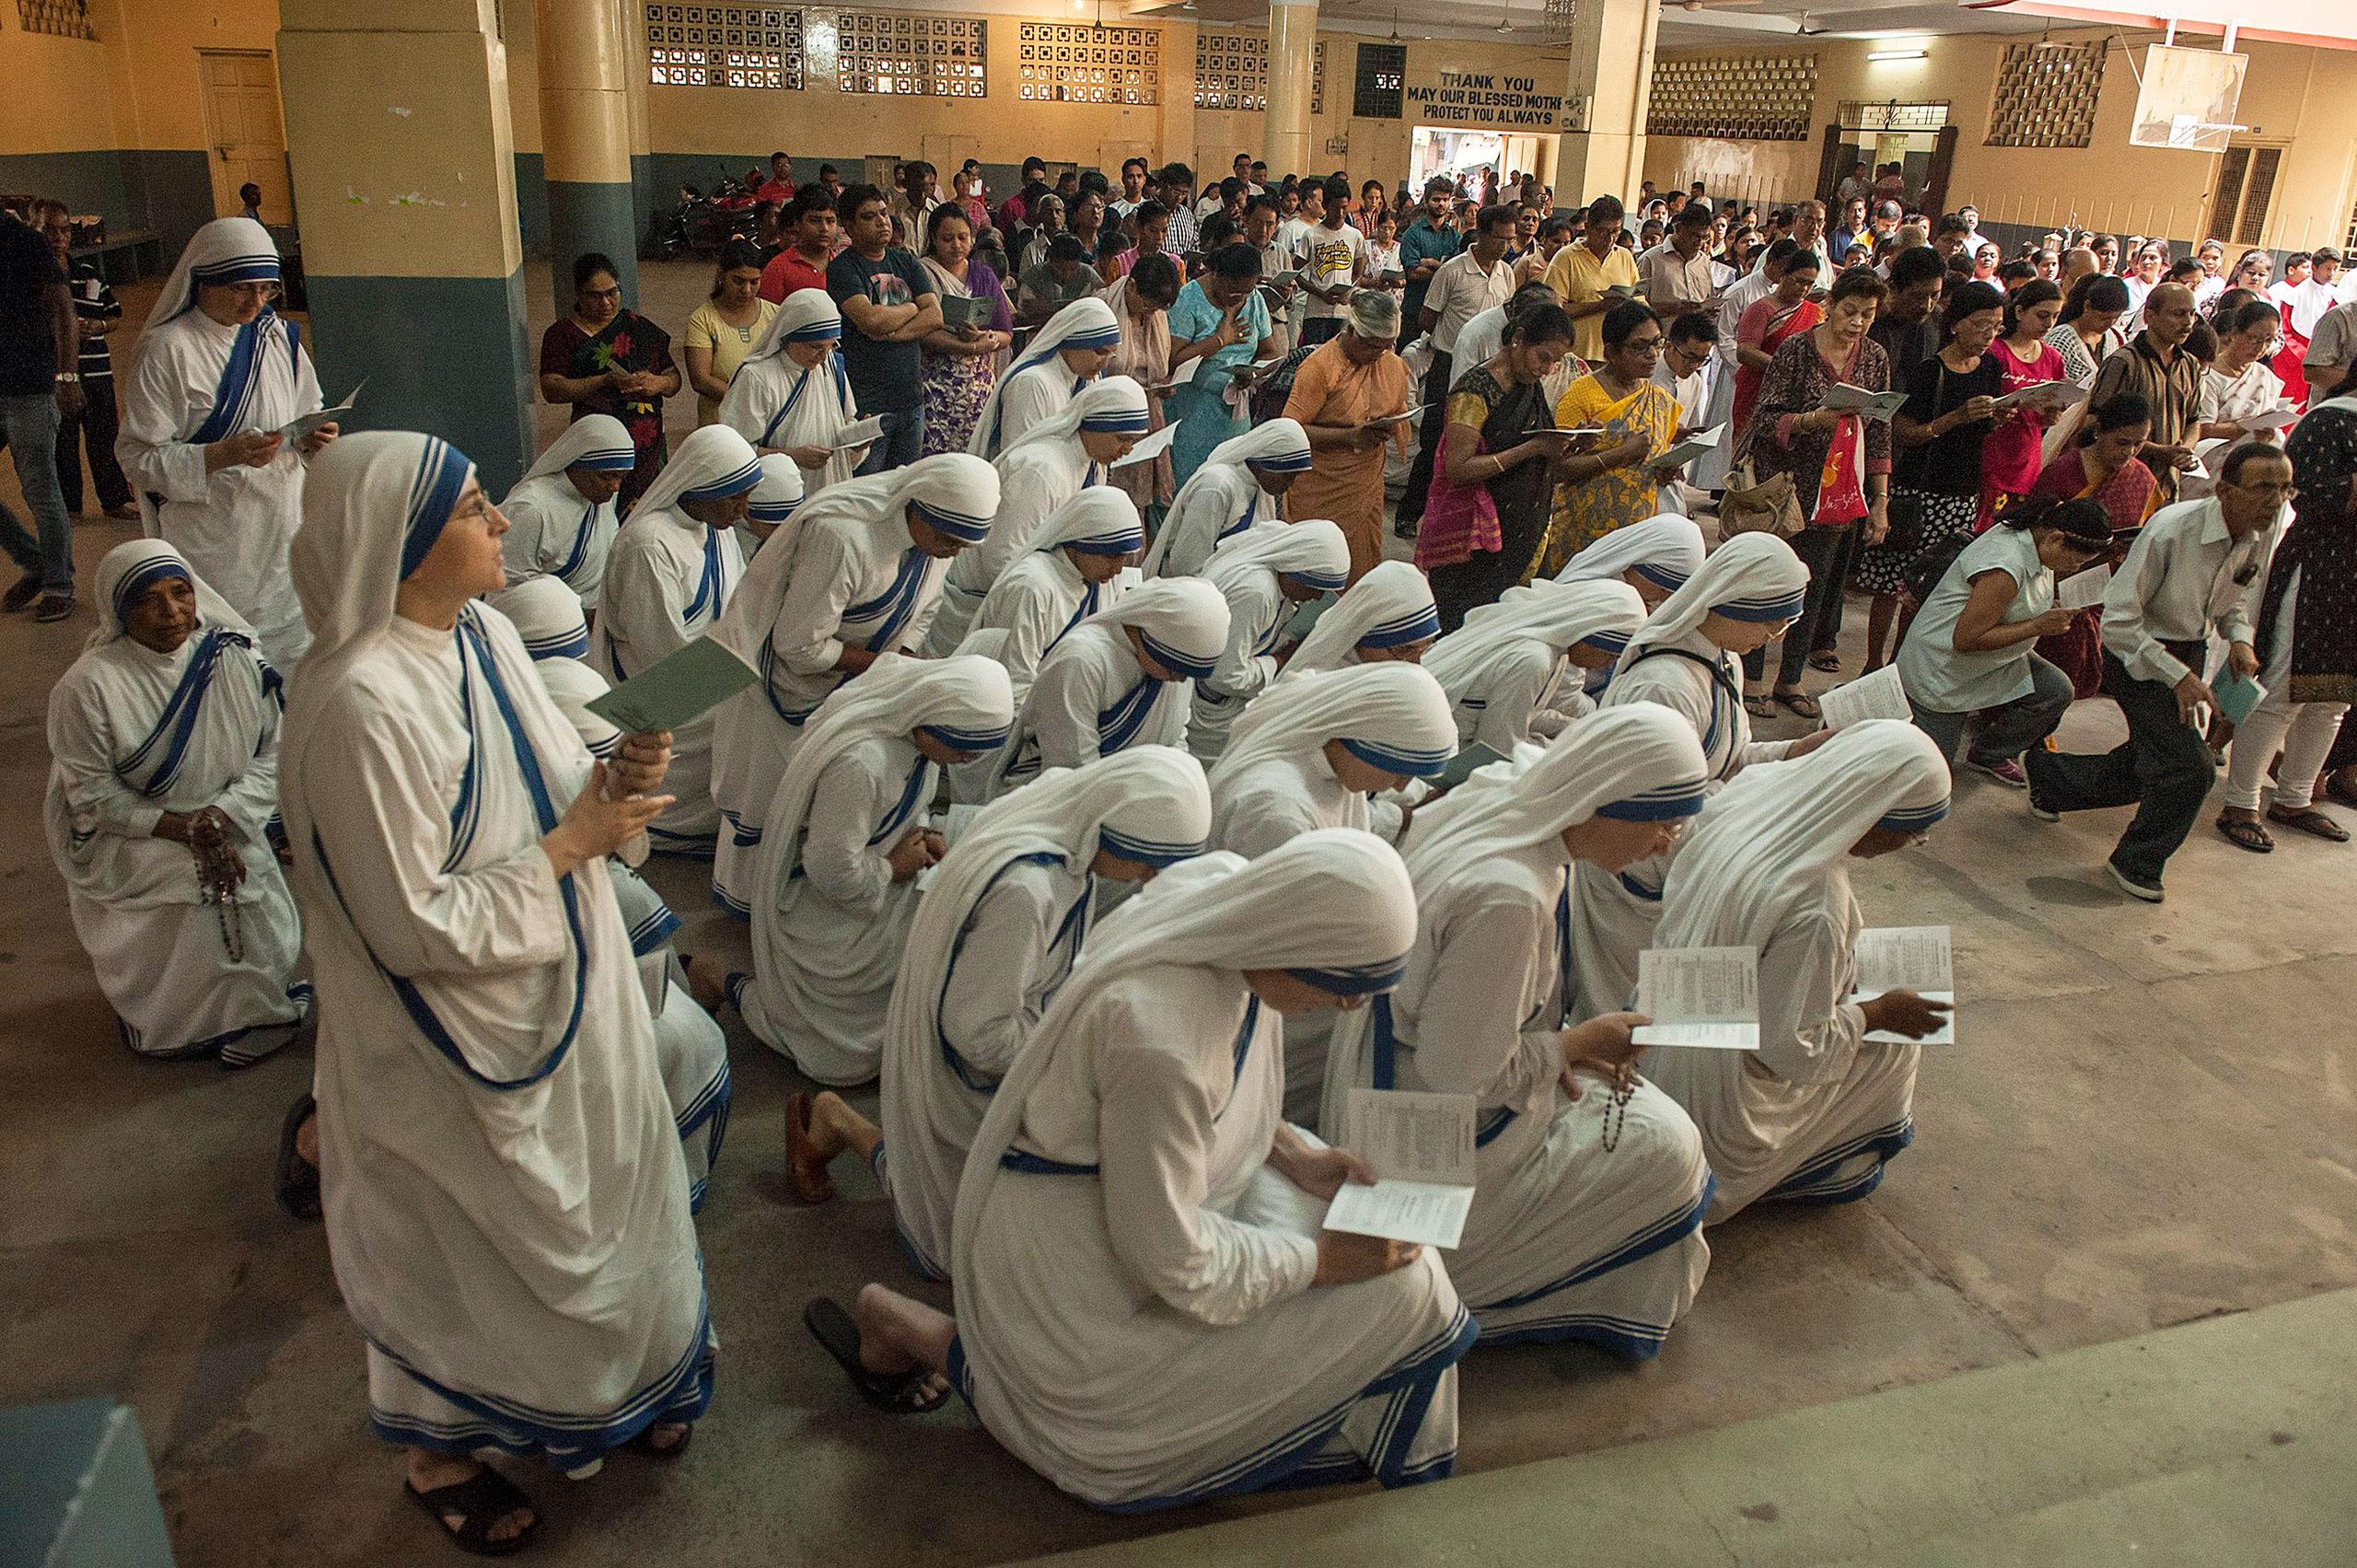 Indian Christians pray at a church on Good Friday in Kolkata, India, March 25, 2016.